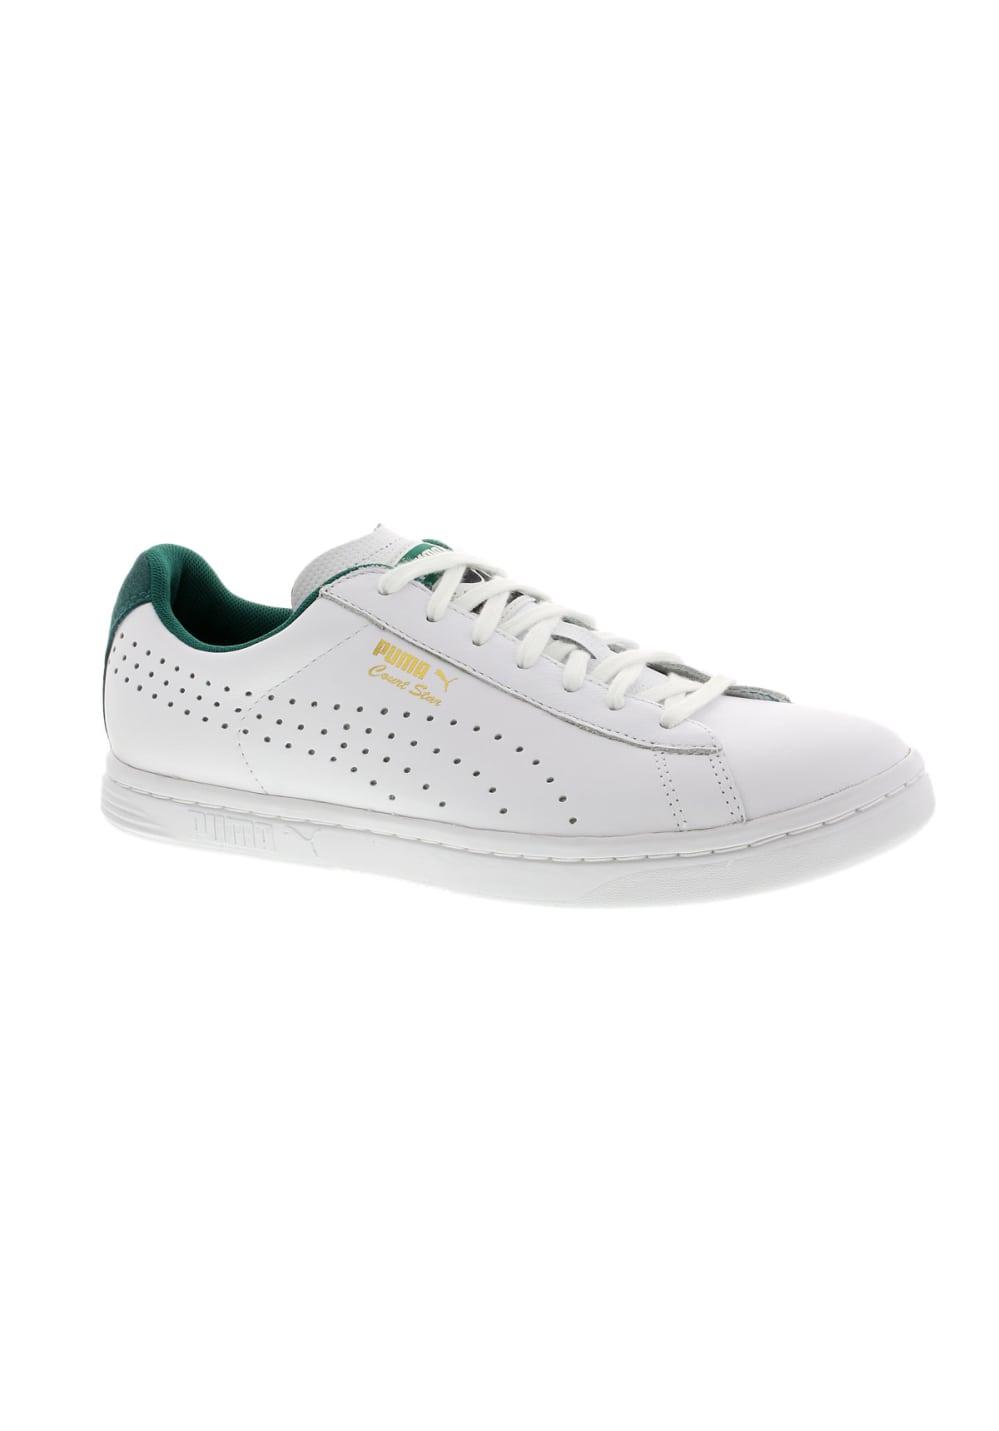 info pour cede5 cce53 Puma Court Star CRFTD - Tennis Shoes for Men - White